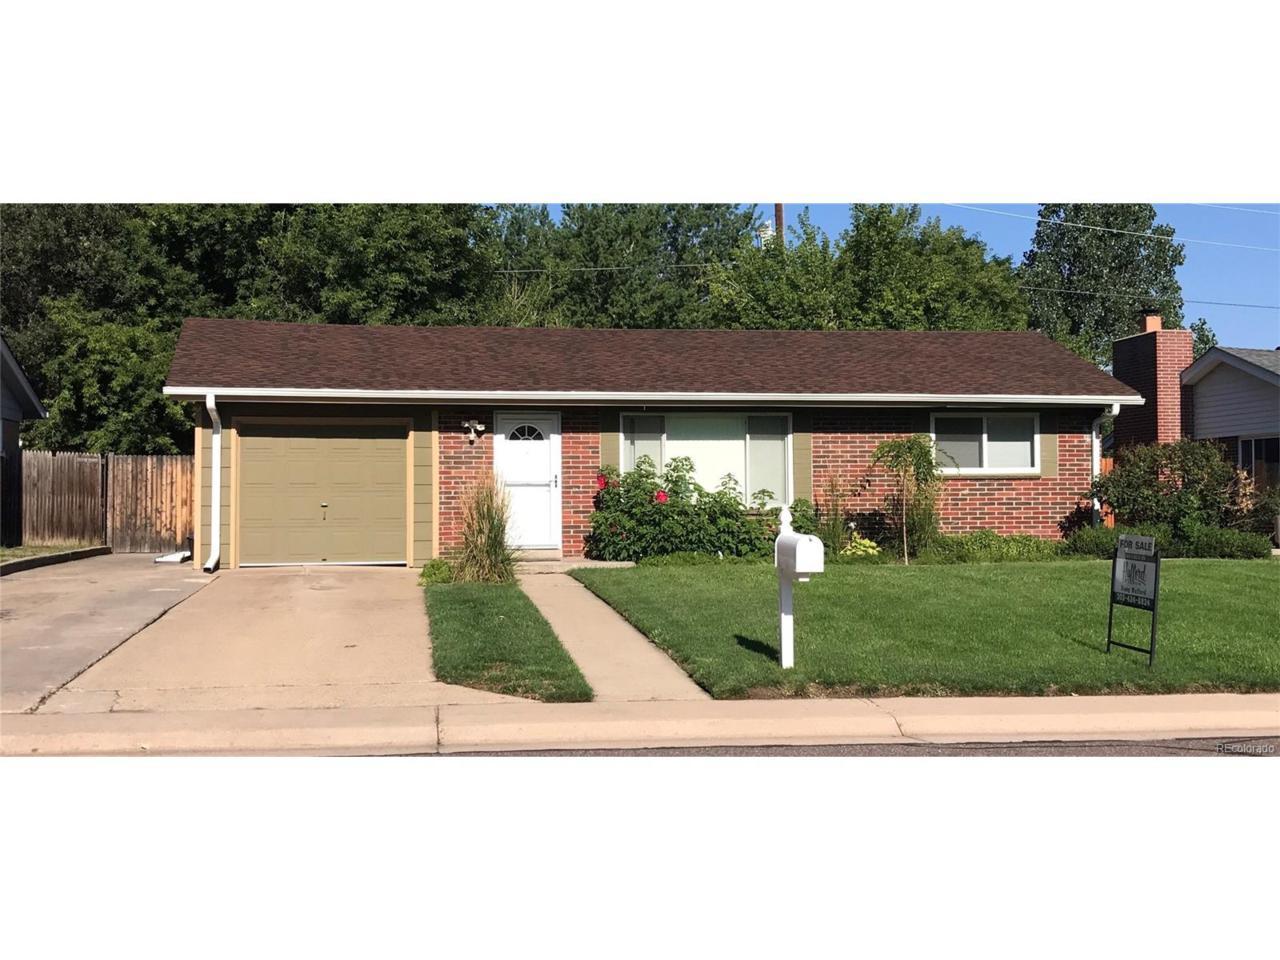 351 S Swadley Street, Lakewood, CO 80228 (MLS #6308122) :: 8z Real Estate